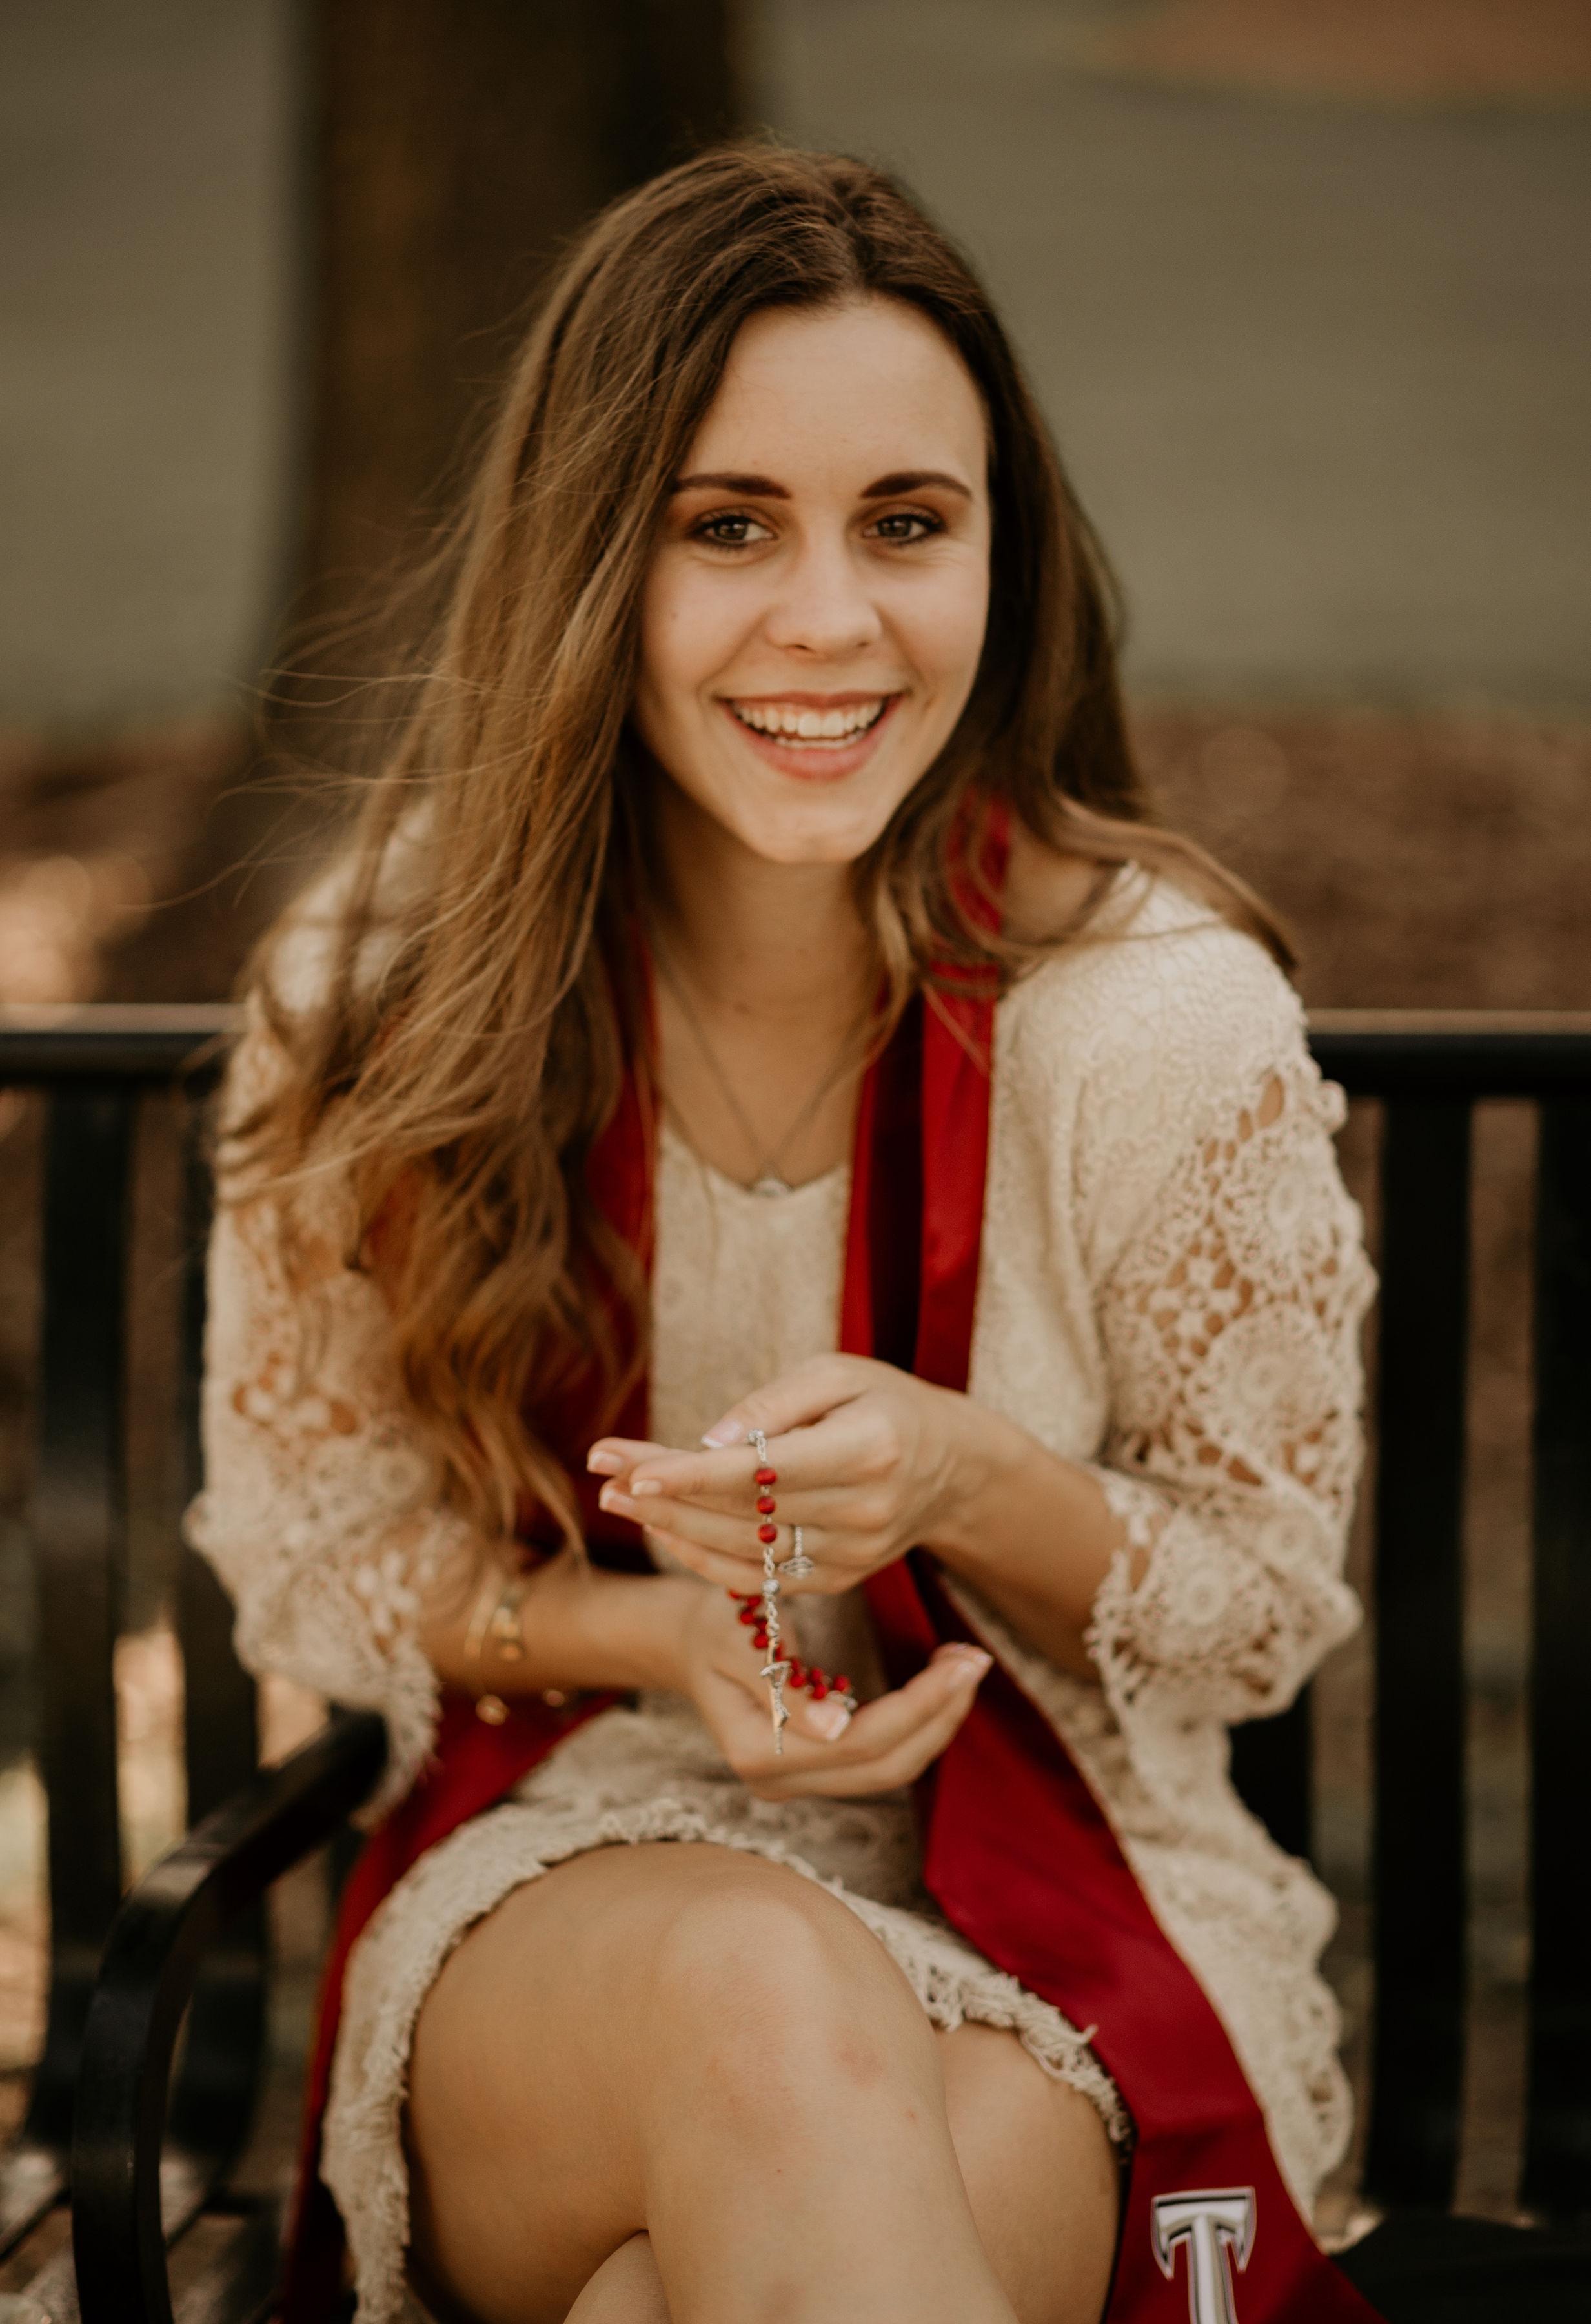 Megan Aaron